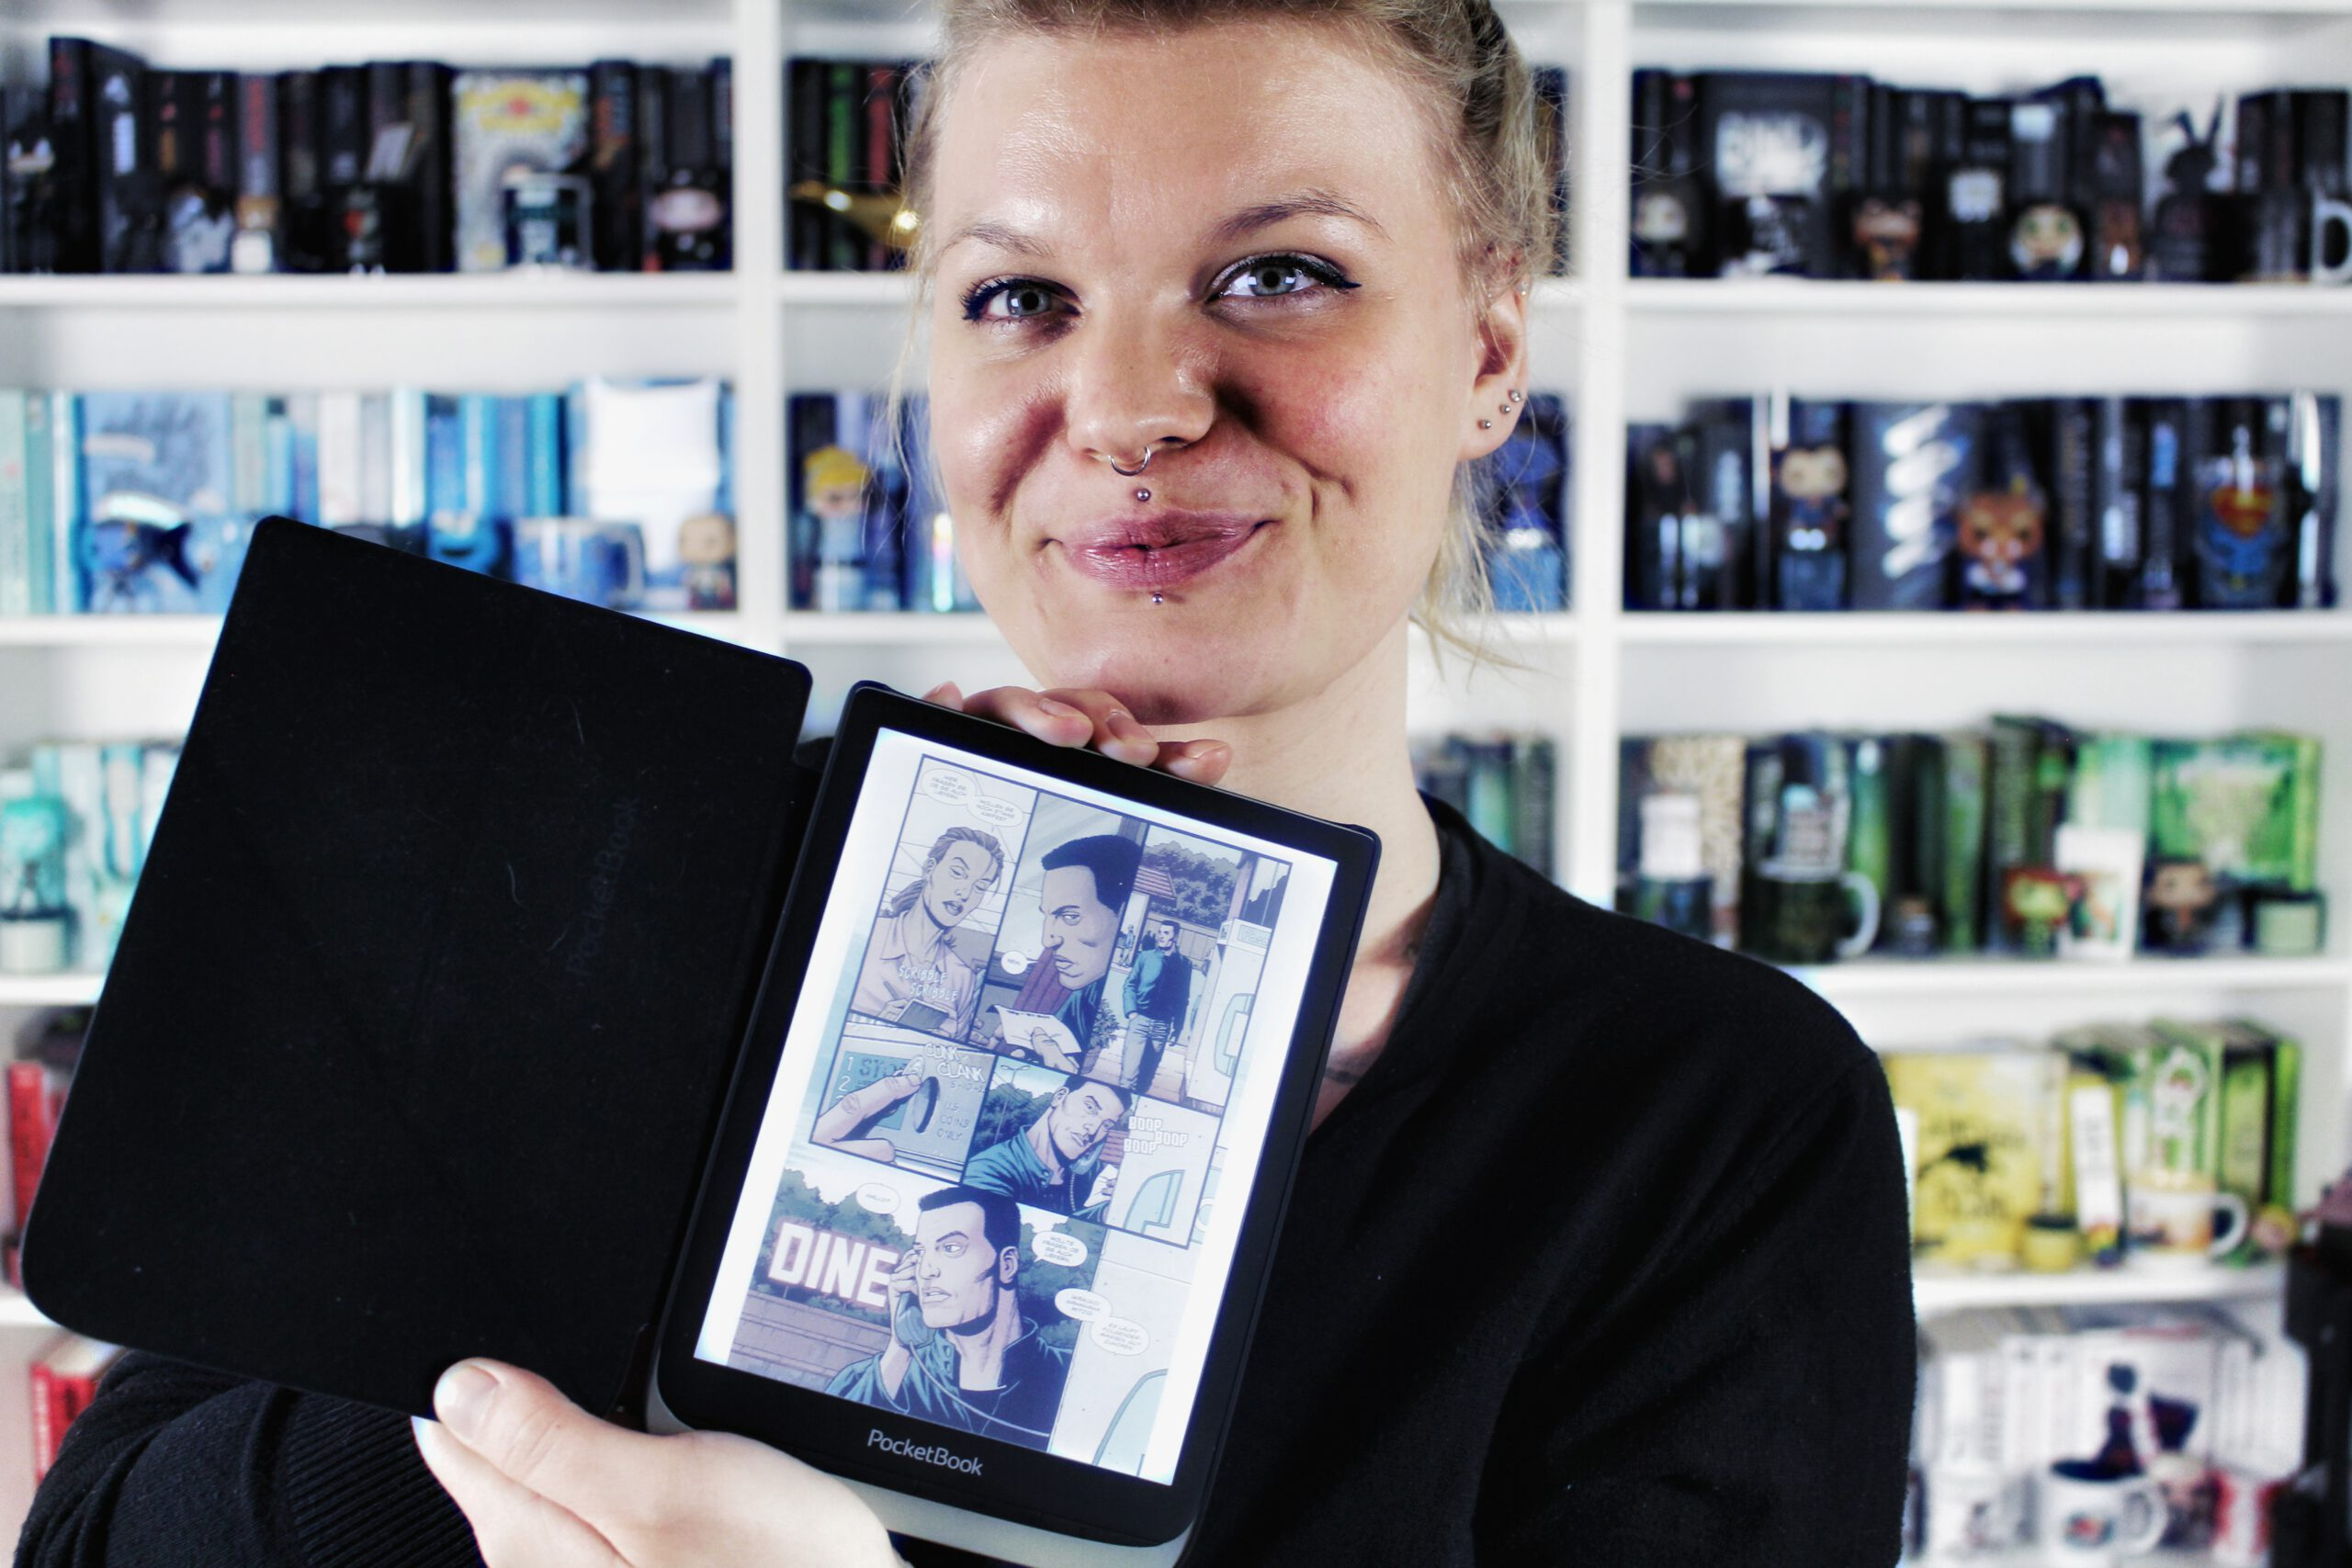 [Wochenrückblick] My PocketBook & Me